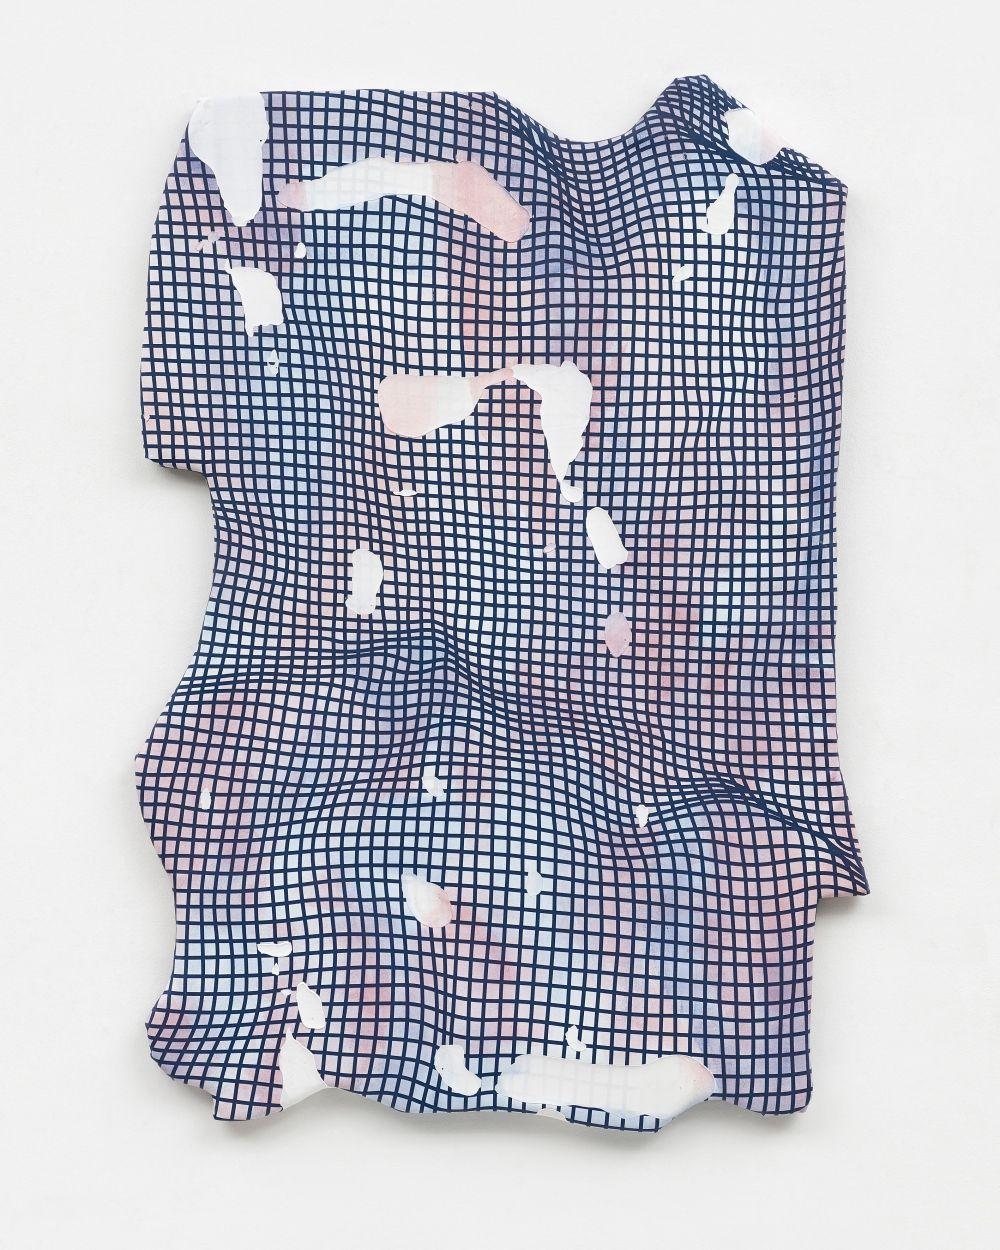 Jeremy DePrez - Untitled, 2015 acrylic and modeling paste on canvas 172,7 x 124,5 x 5 cm